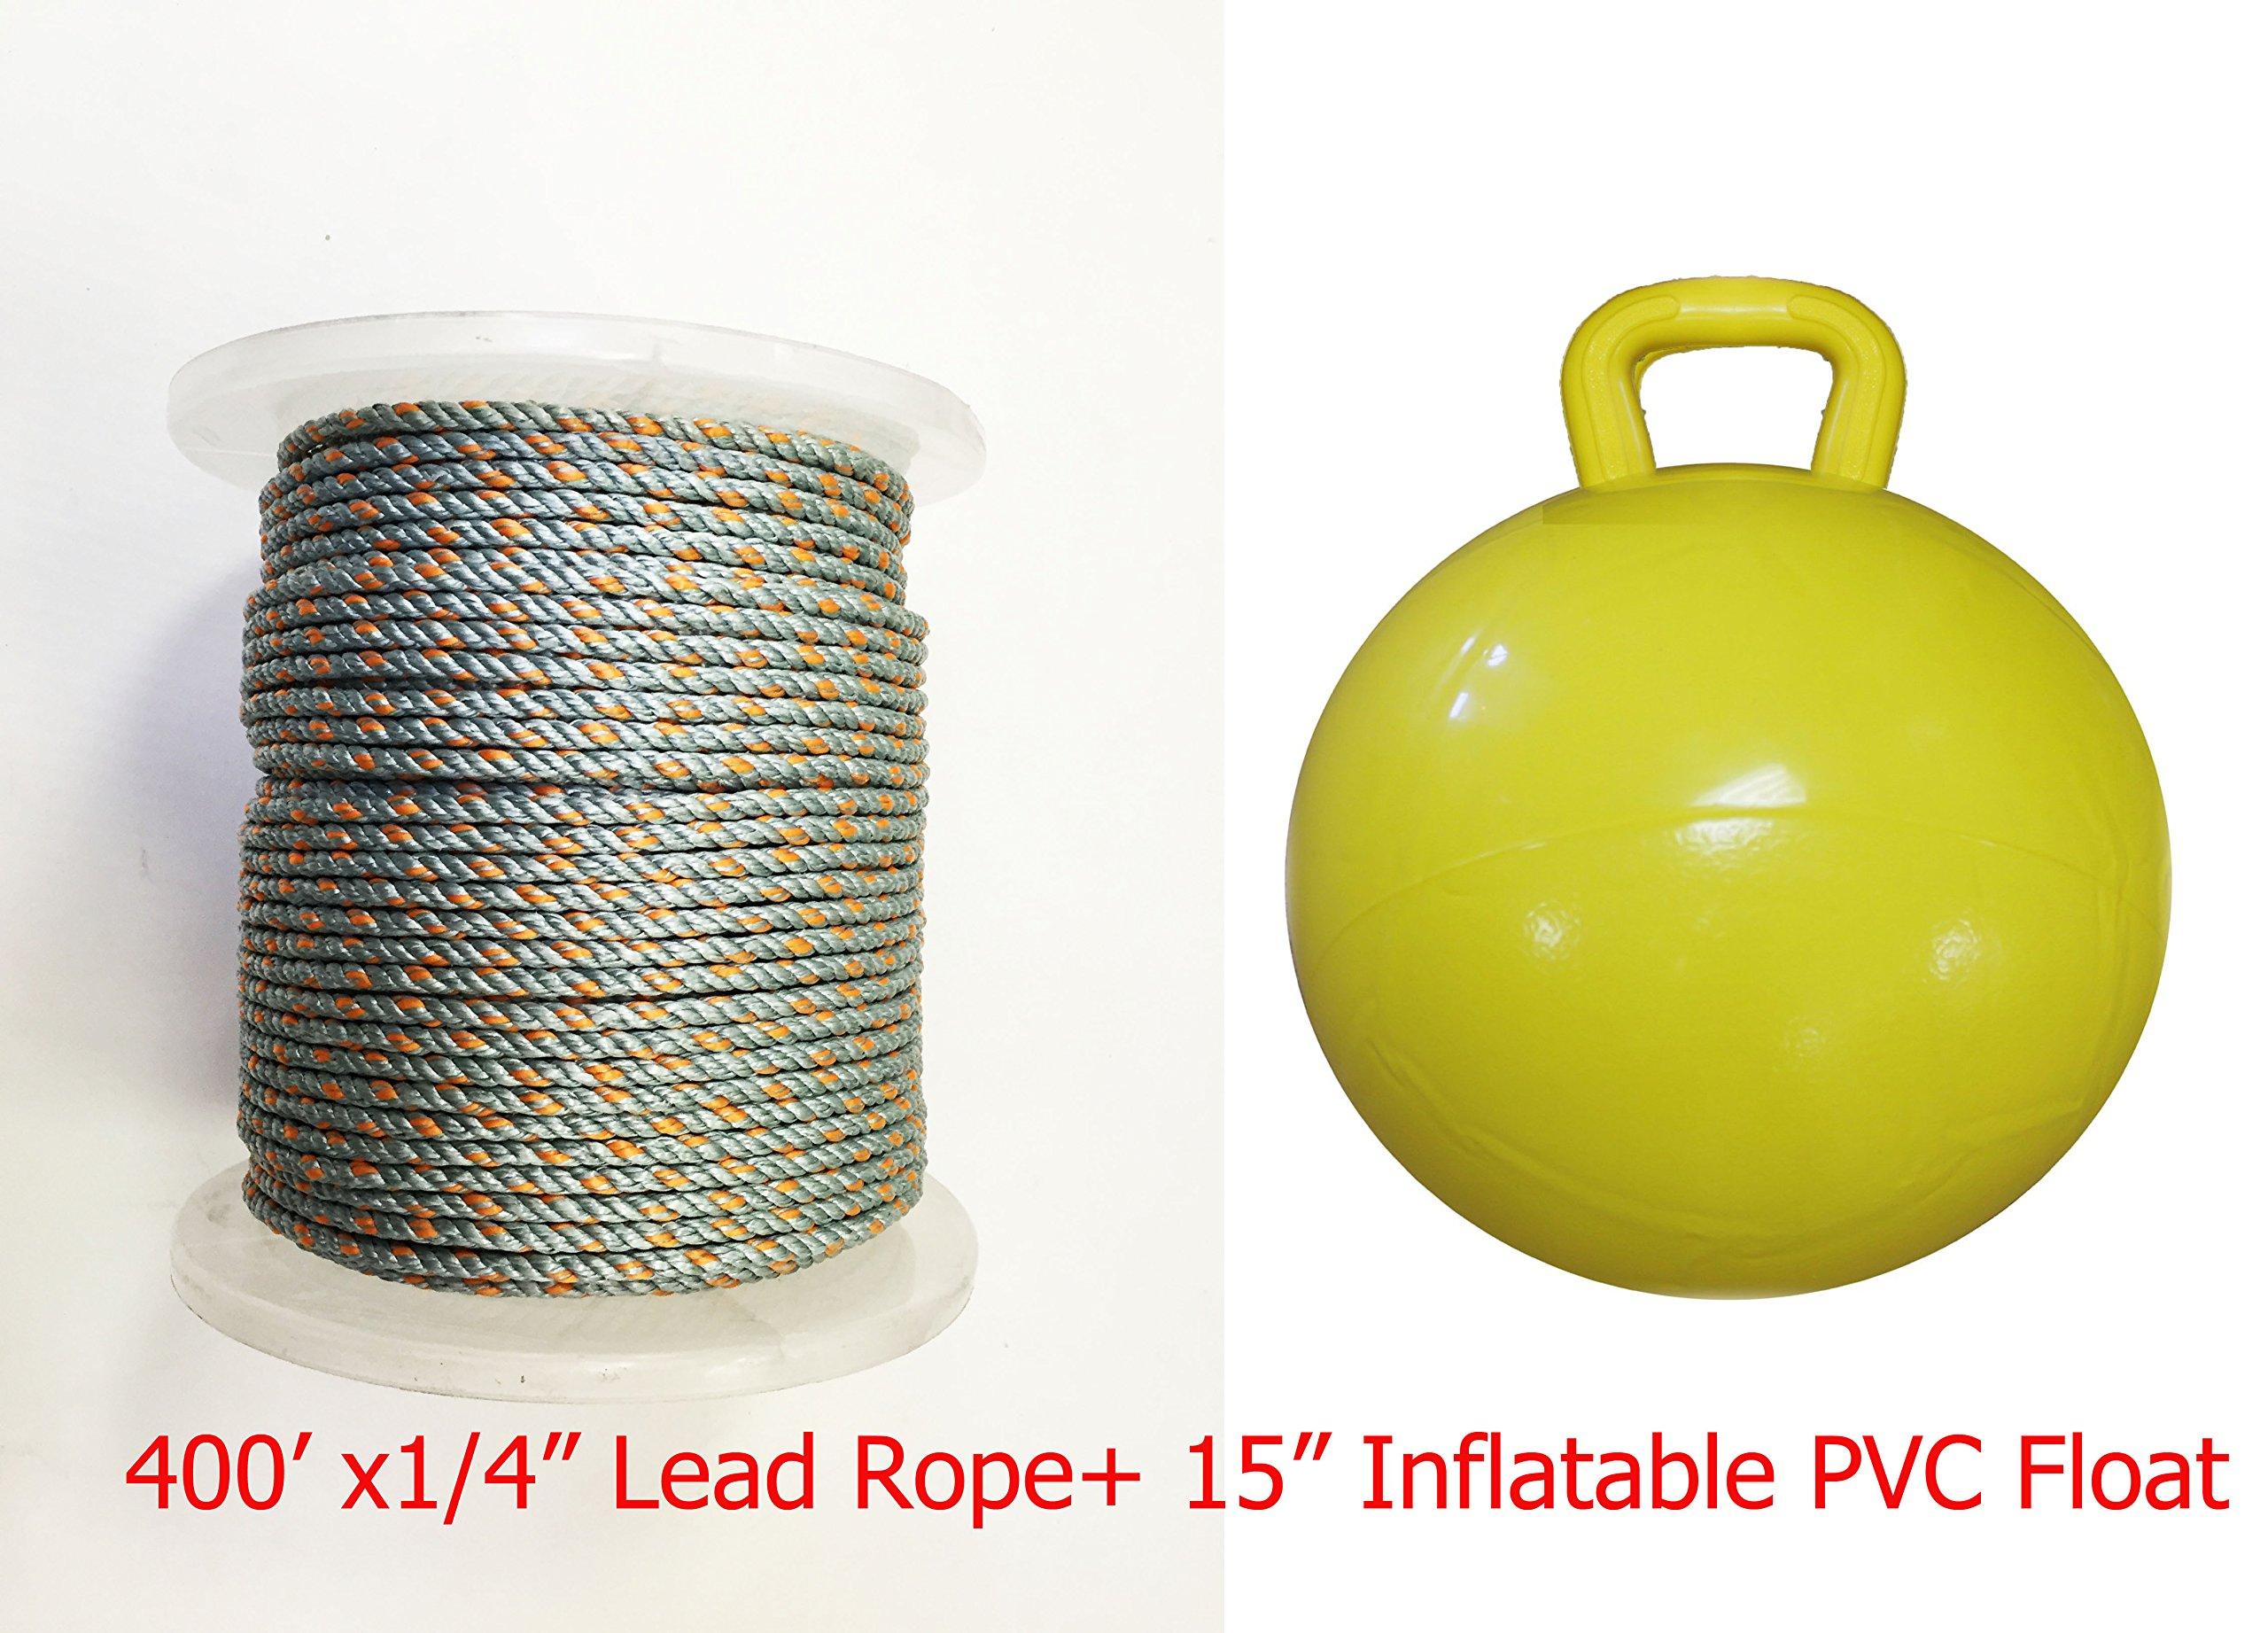 KUFA Sports 1/4 Diameter/400' Lead Core Rope & 15'' Inflatable Yellow Floats by KUFA Sports